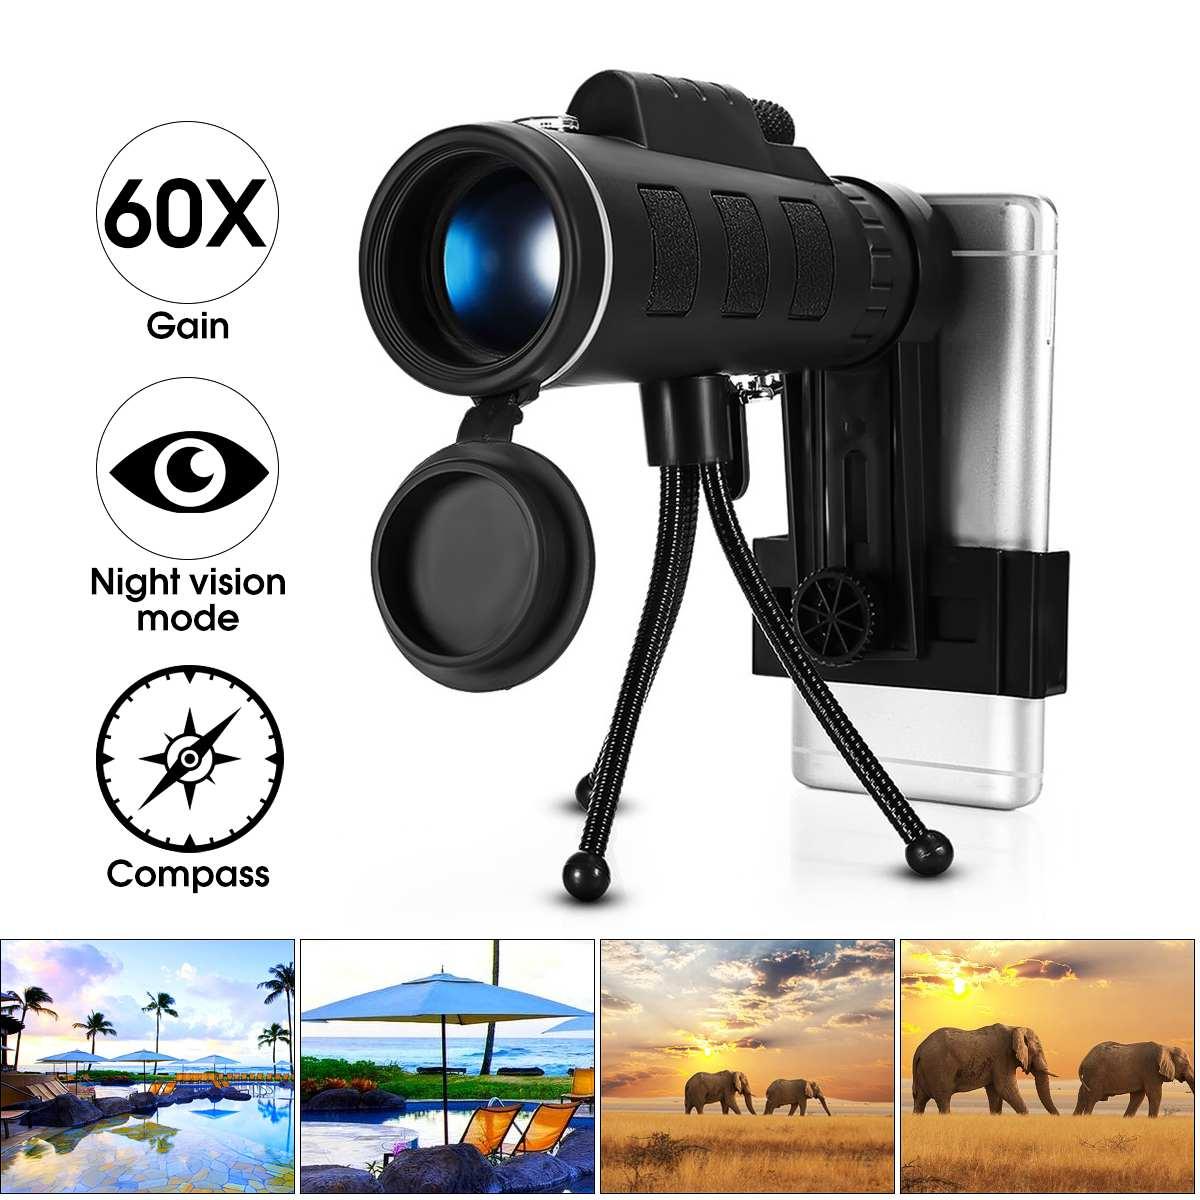 telescope telephoto zoom photo camera lens for smartphones features